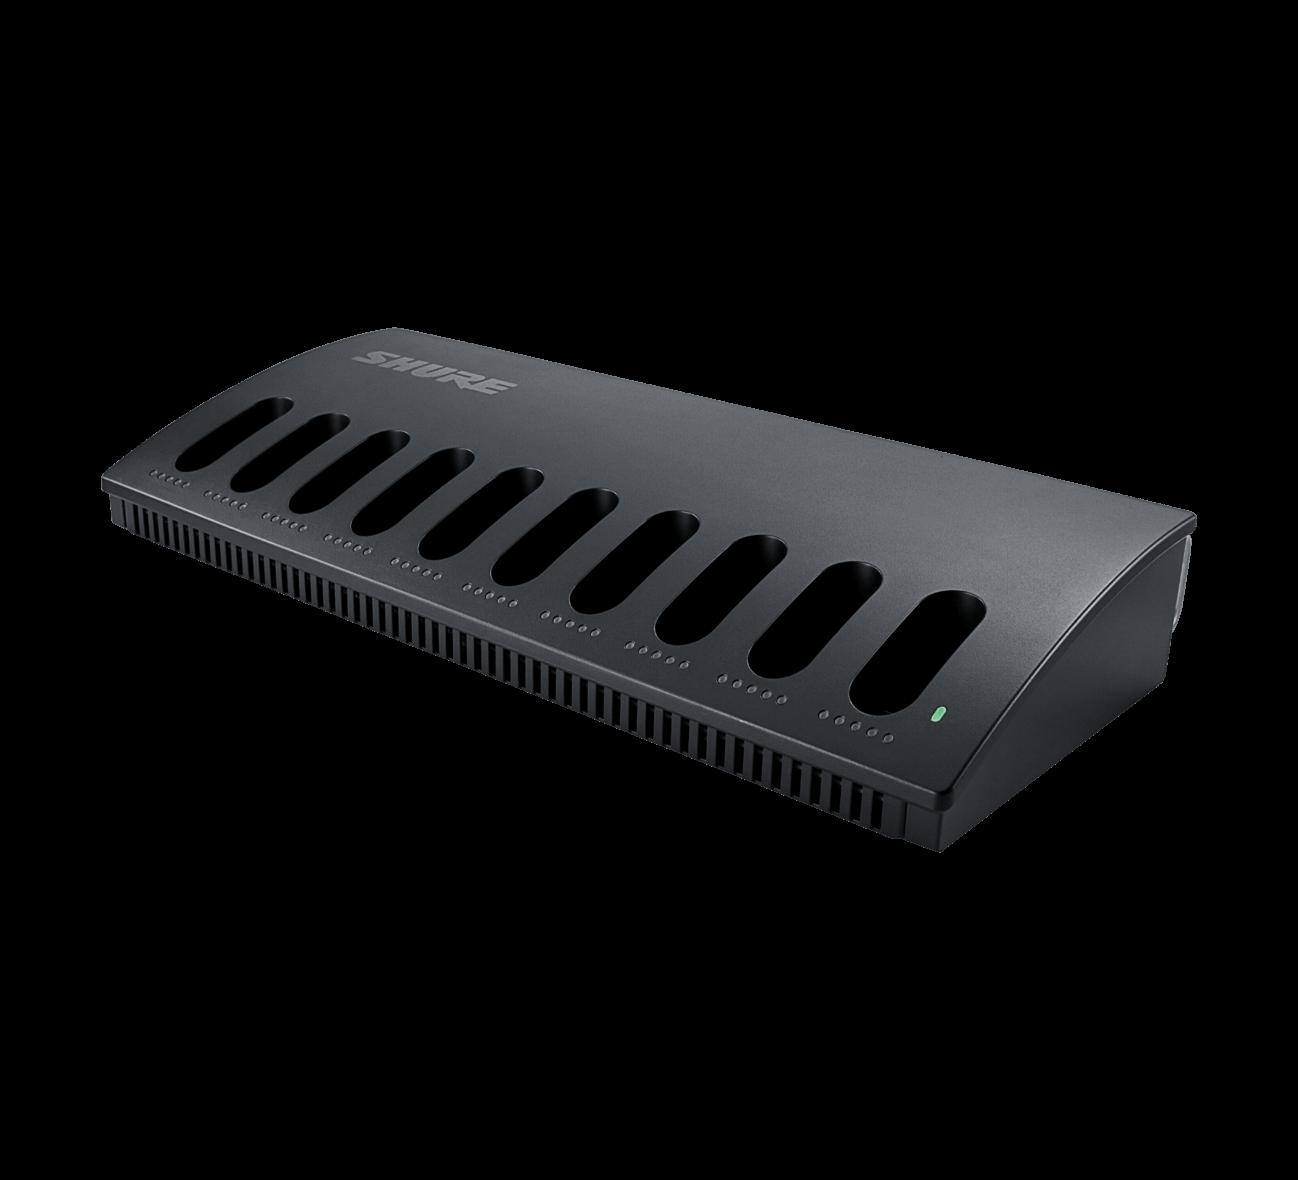 Cargador para  microflex complete  en red-Mxcwncs